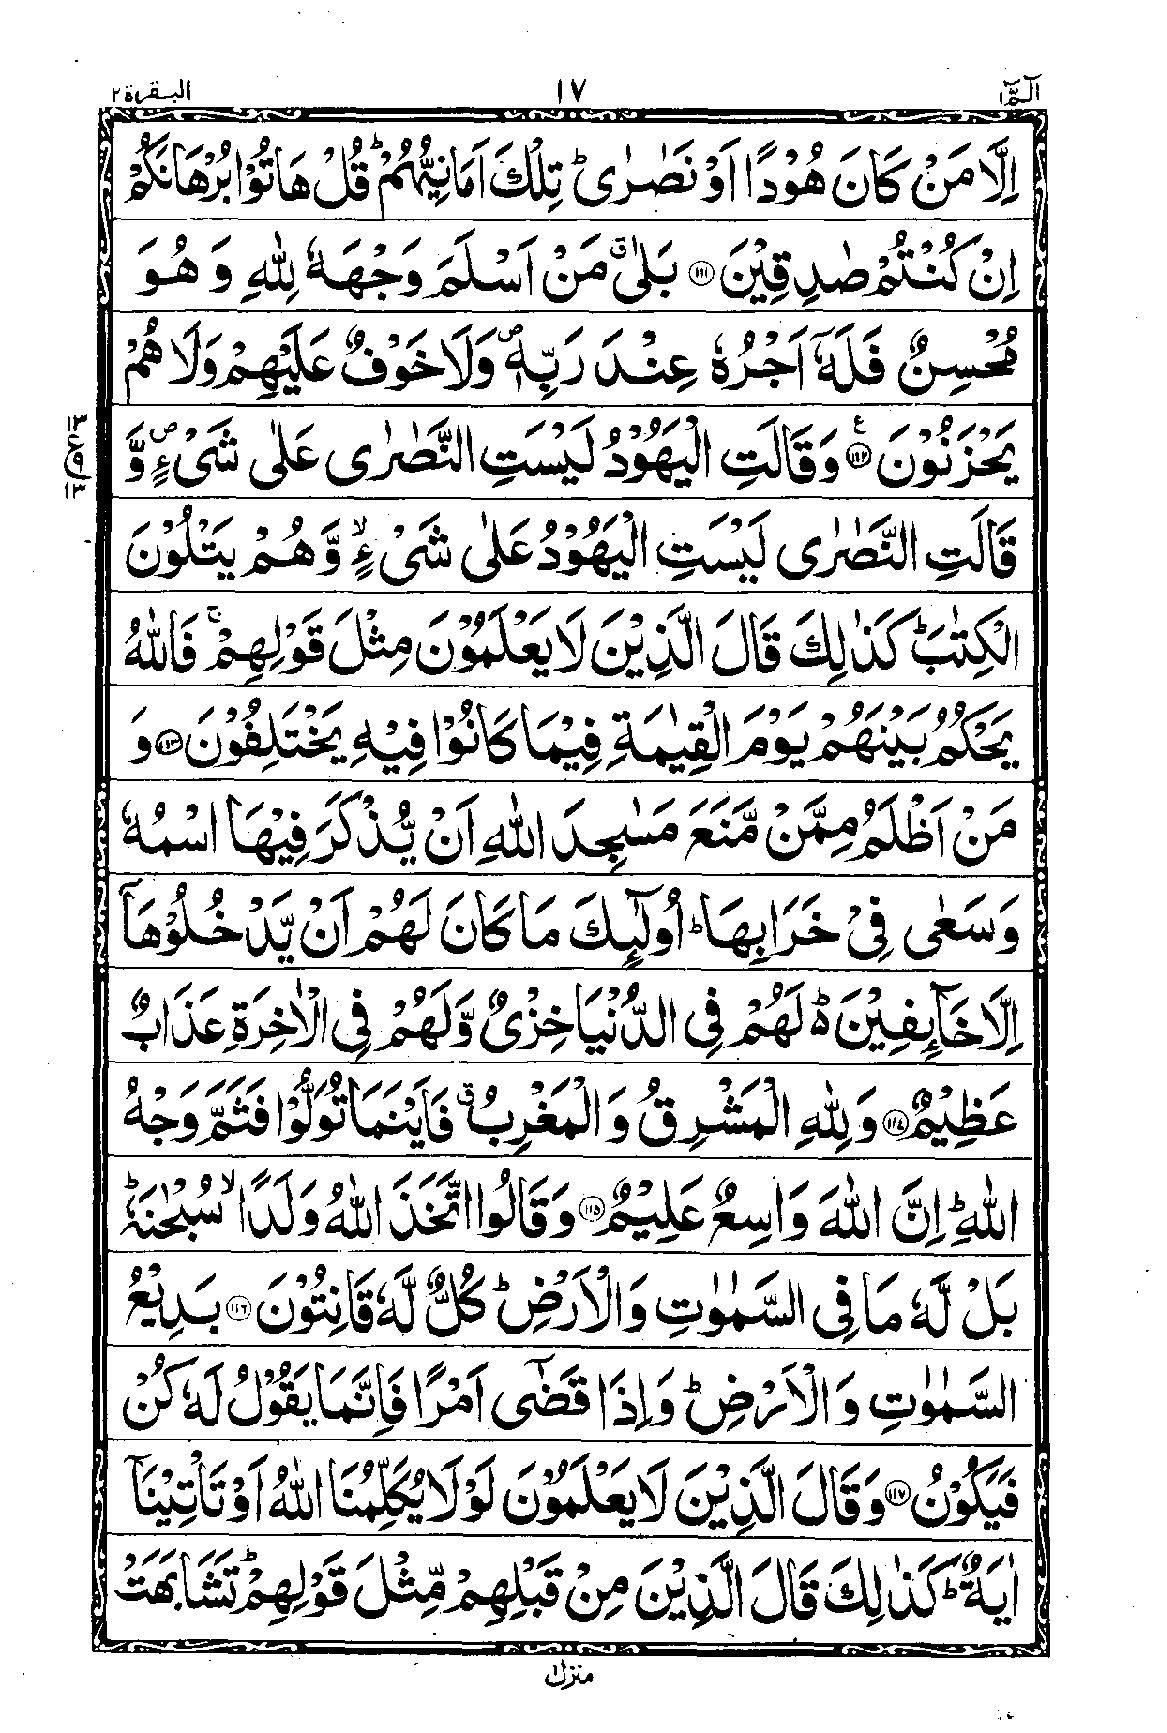 AL QURAN 16 LINES TAJ COMPANY | QASIM | Line, Quran, Words